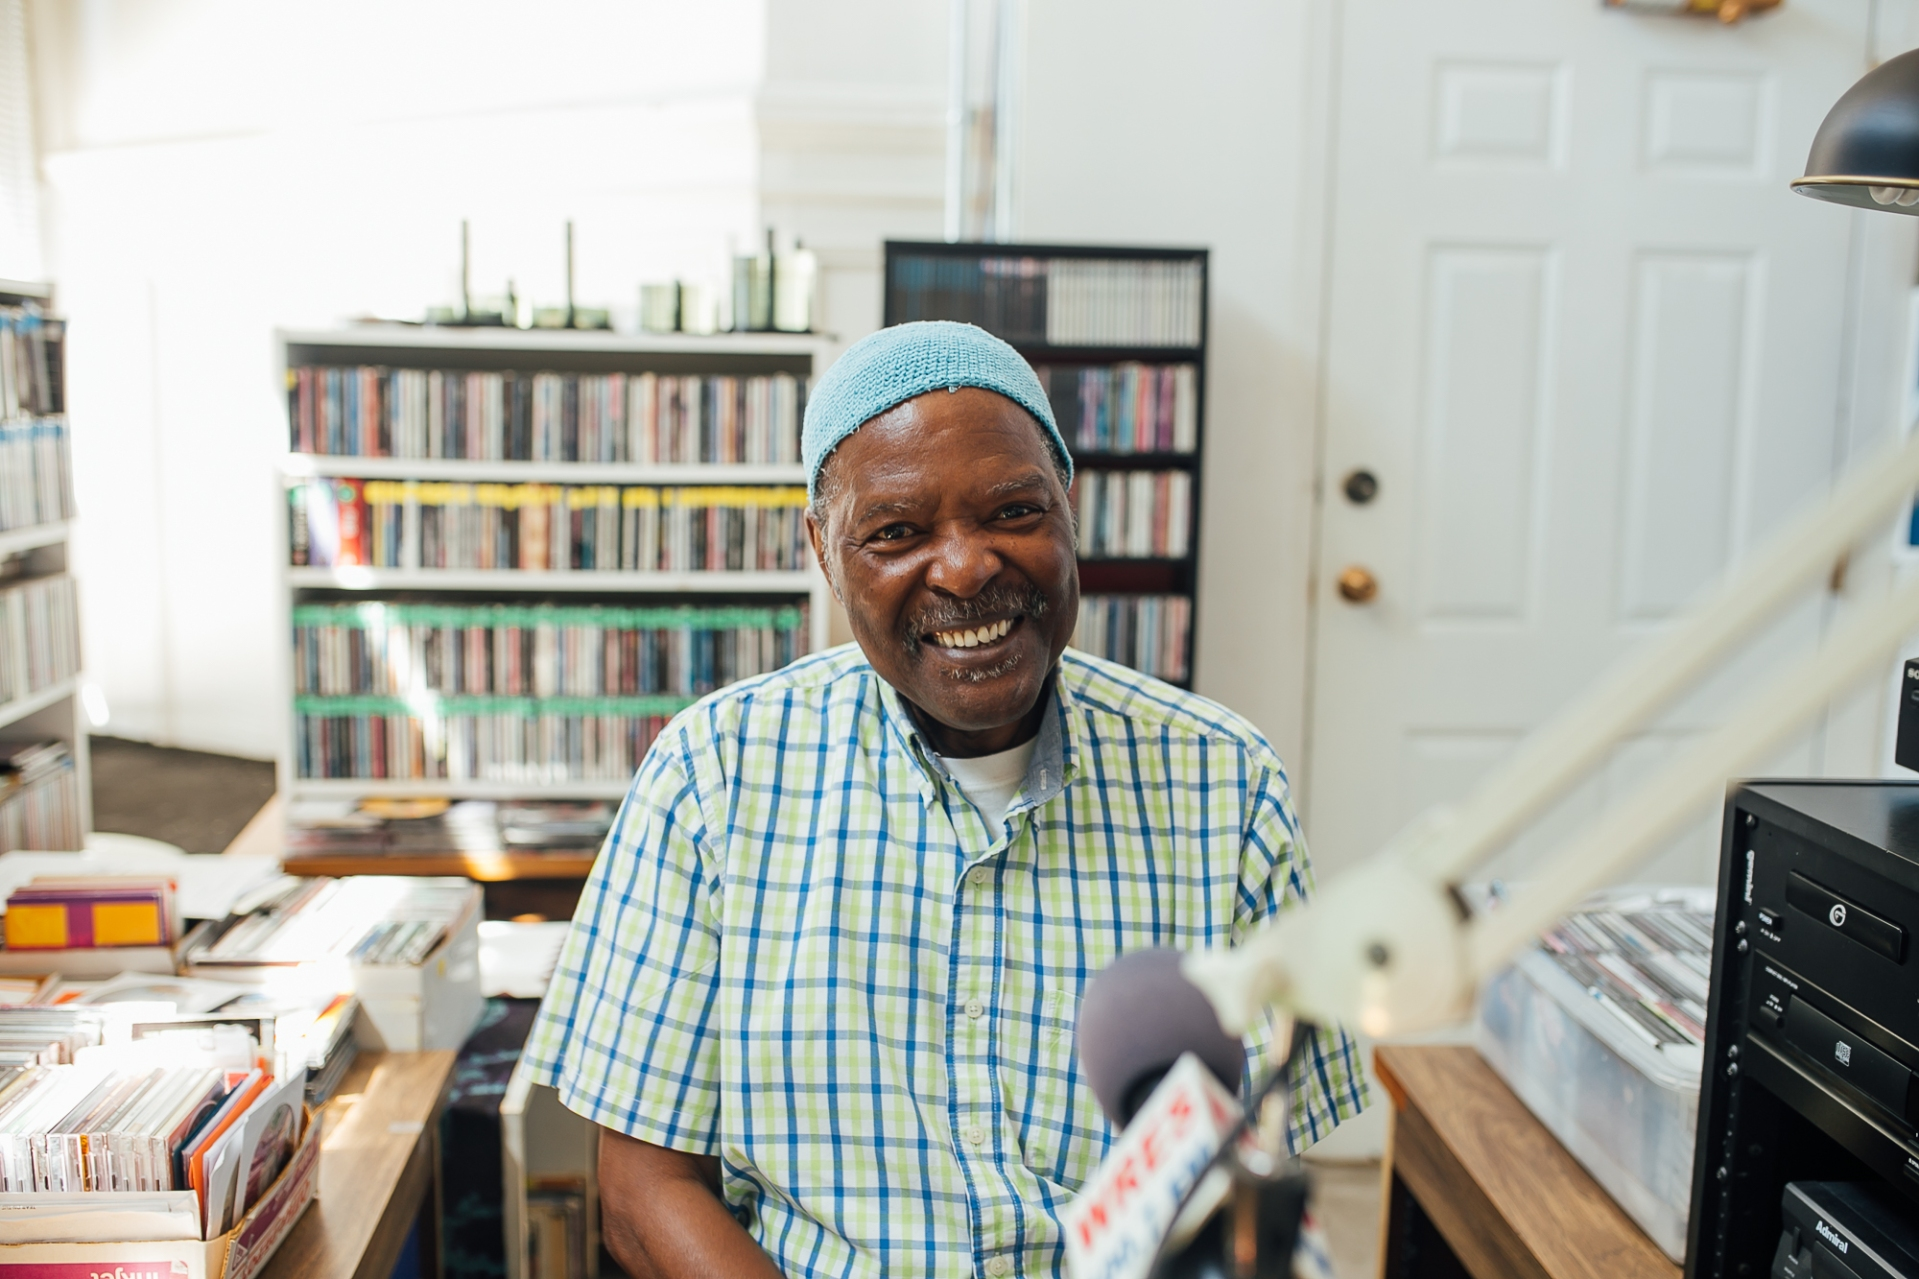 Elder John R. Hayes WRES FM Community Action